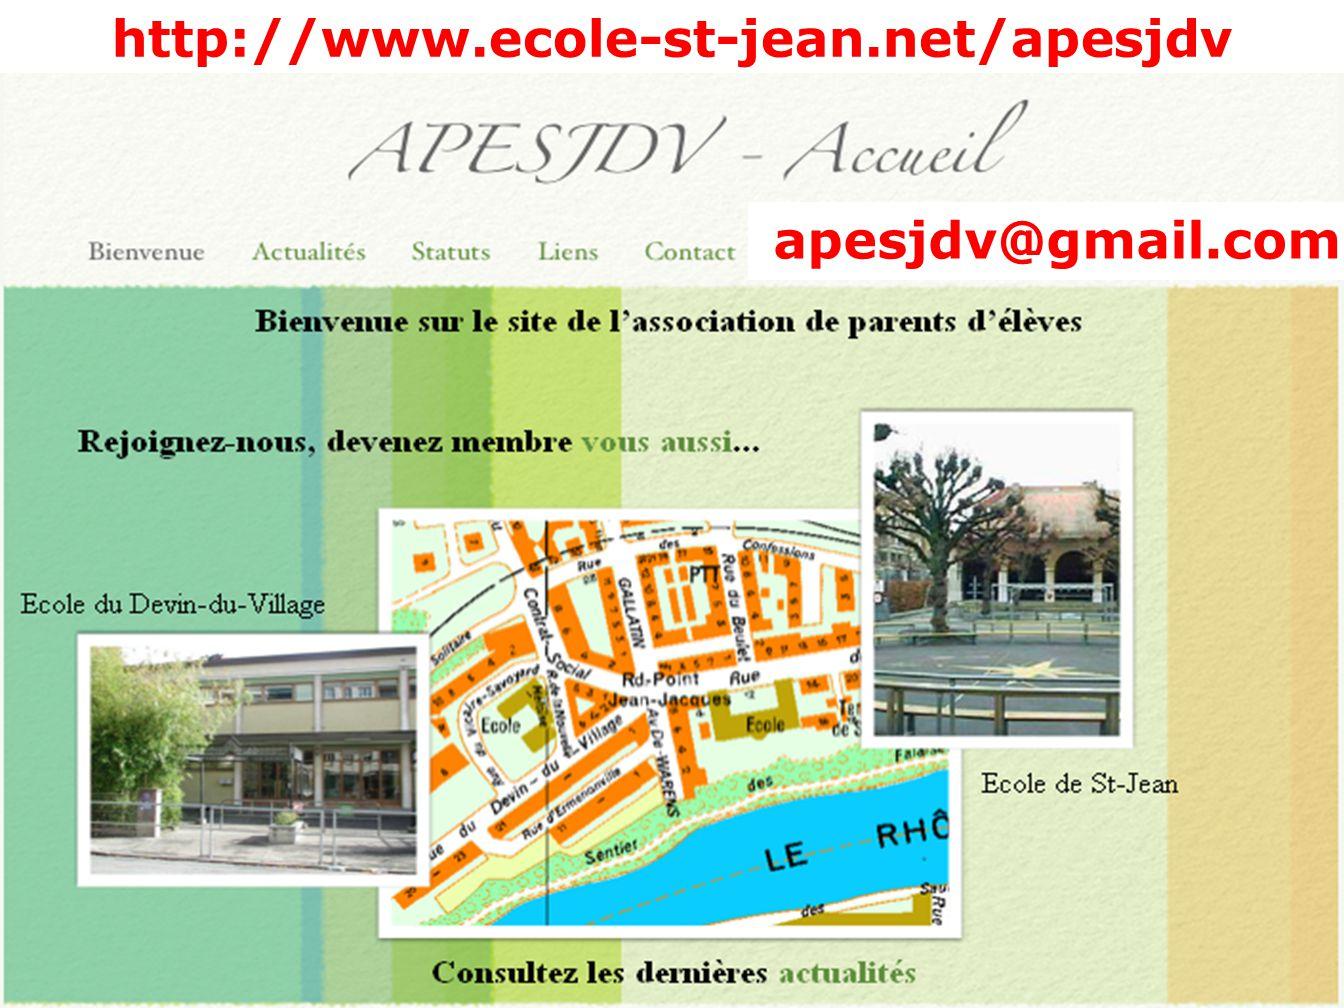 http://www.ecole-st-jean.net/apesjdv apesjdv@gmail.com